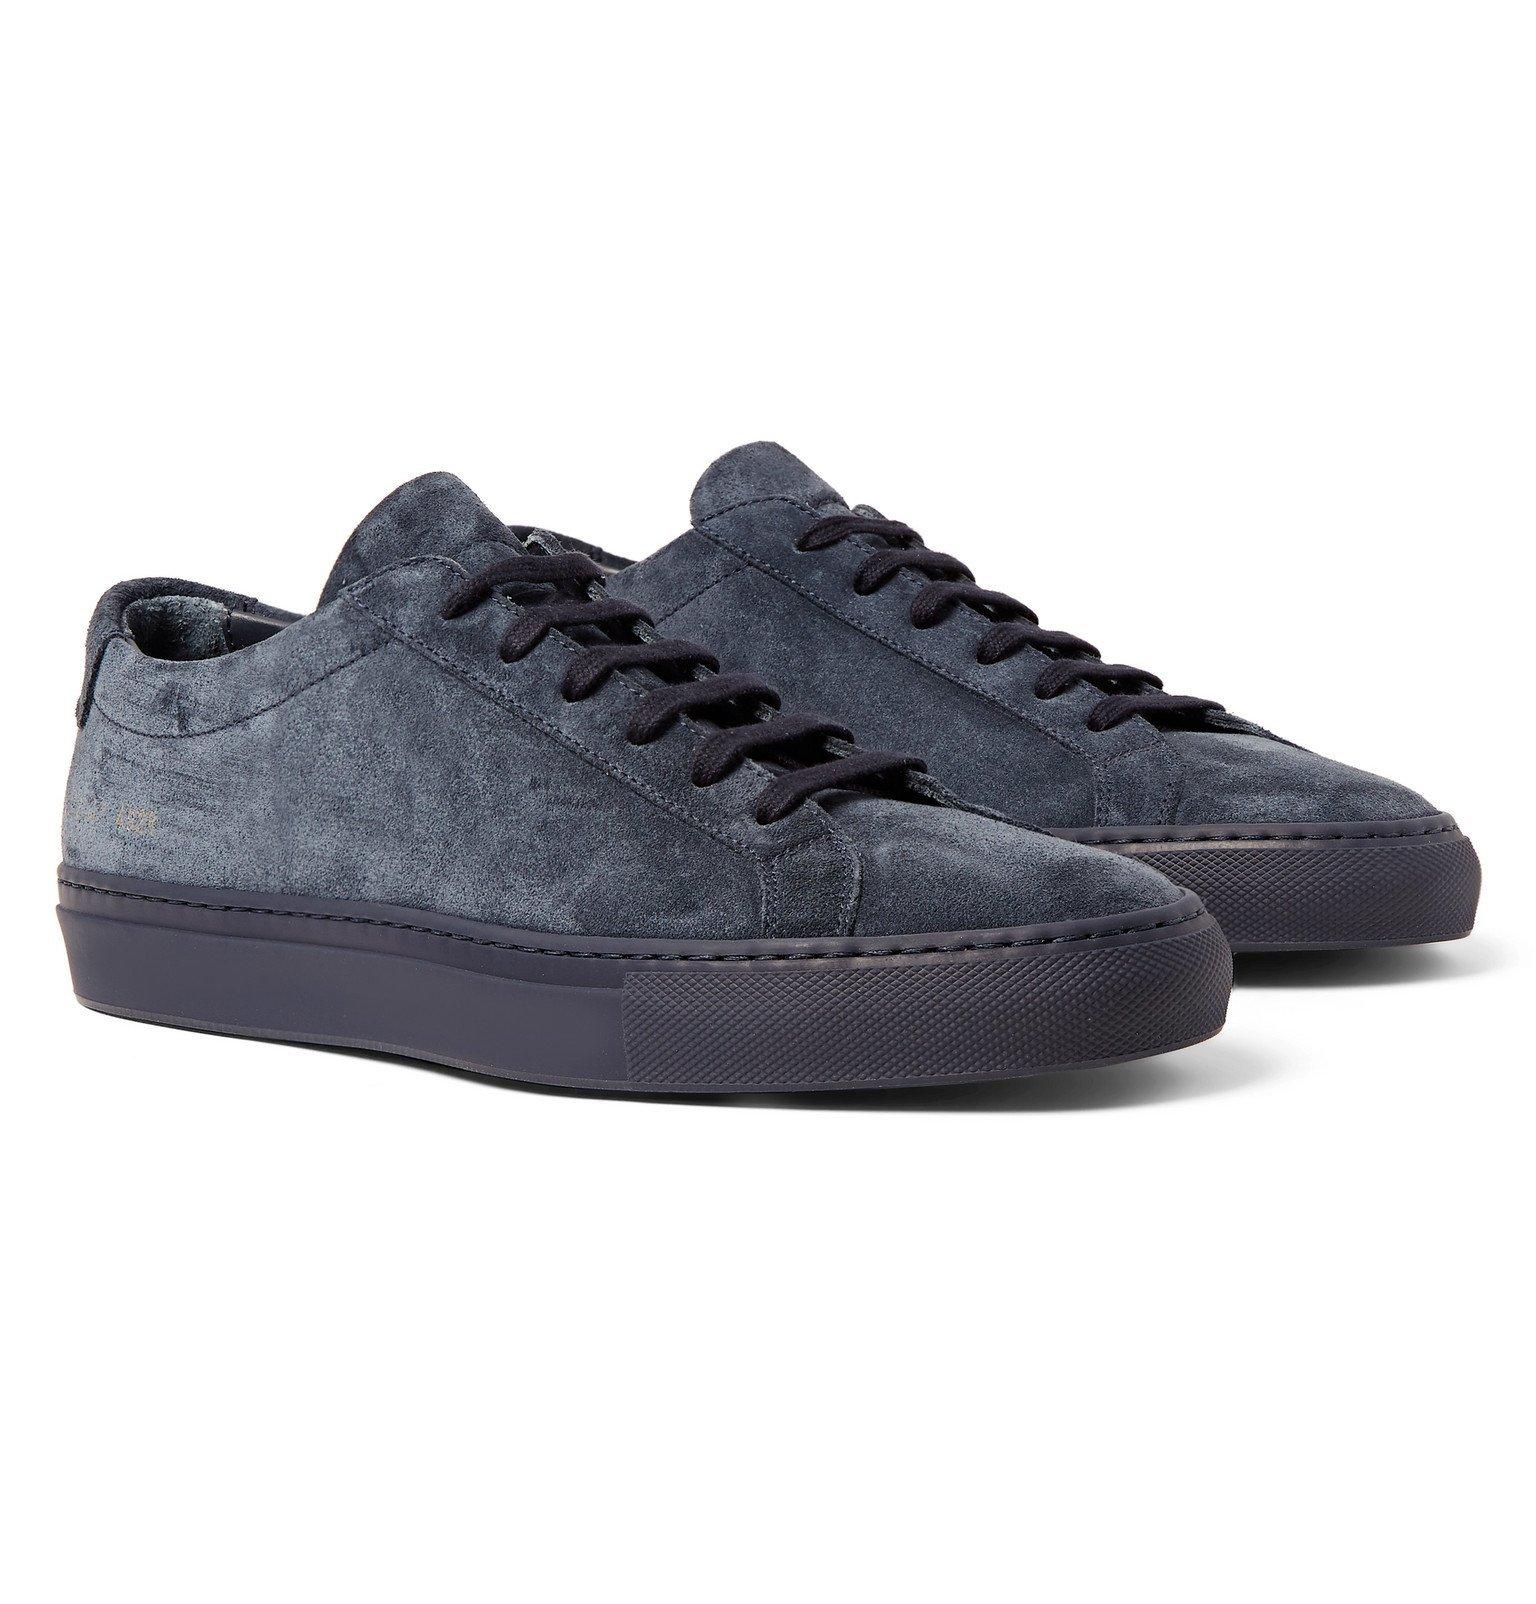 Common Projects - Original Achilles Suede Sneakers - Blue